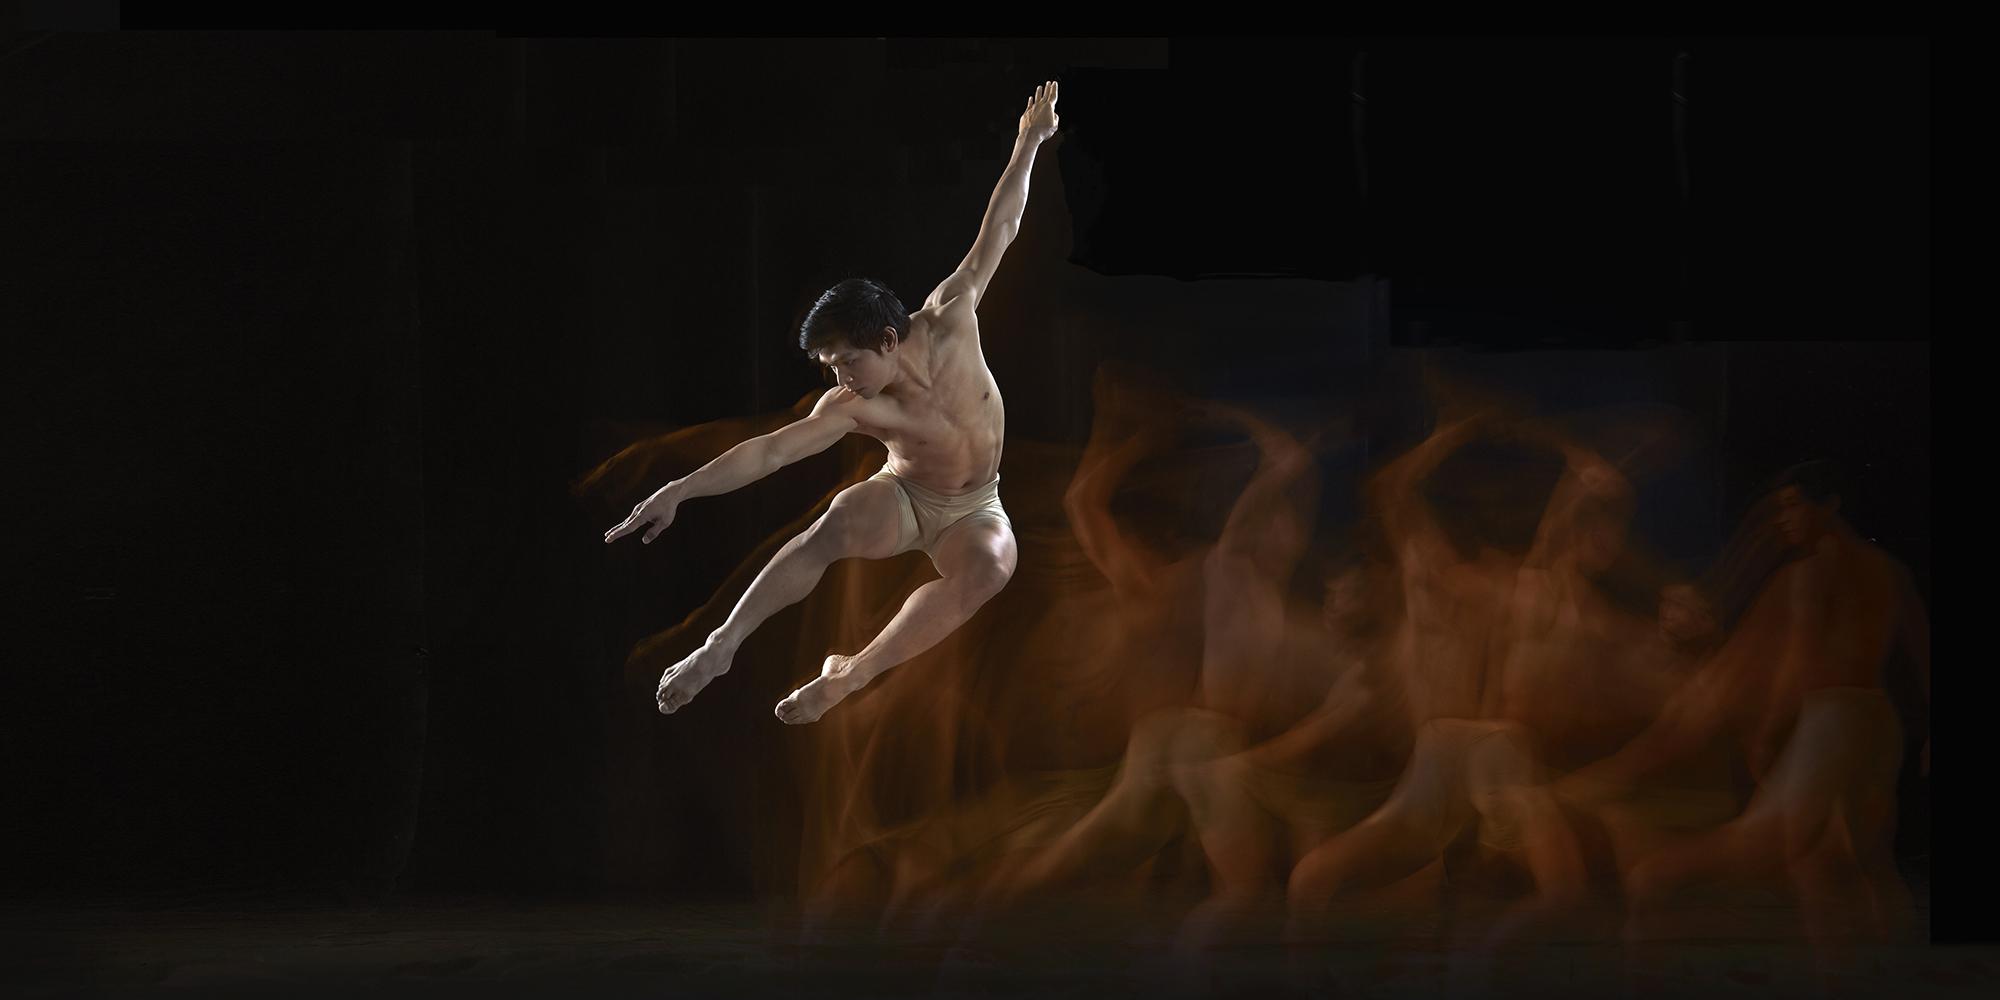 Gerardo Francisco: Jump shot. Photo by G-nie Arambulo